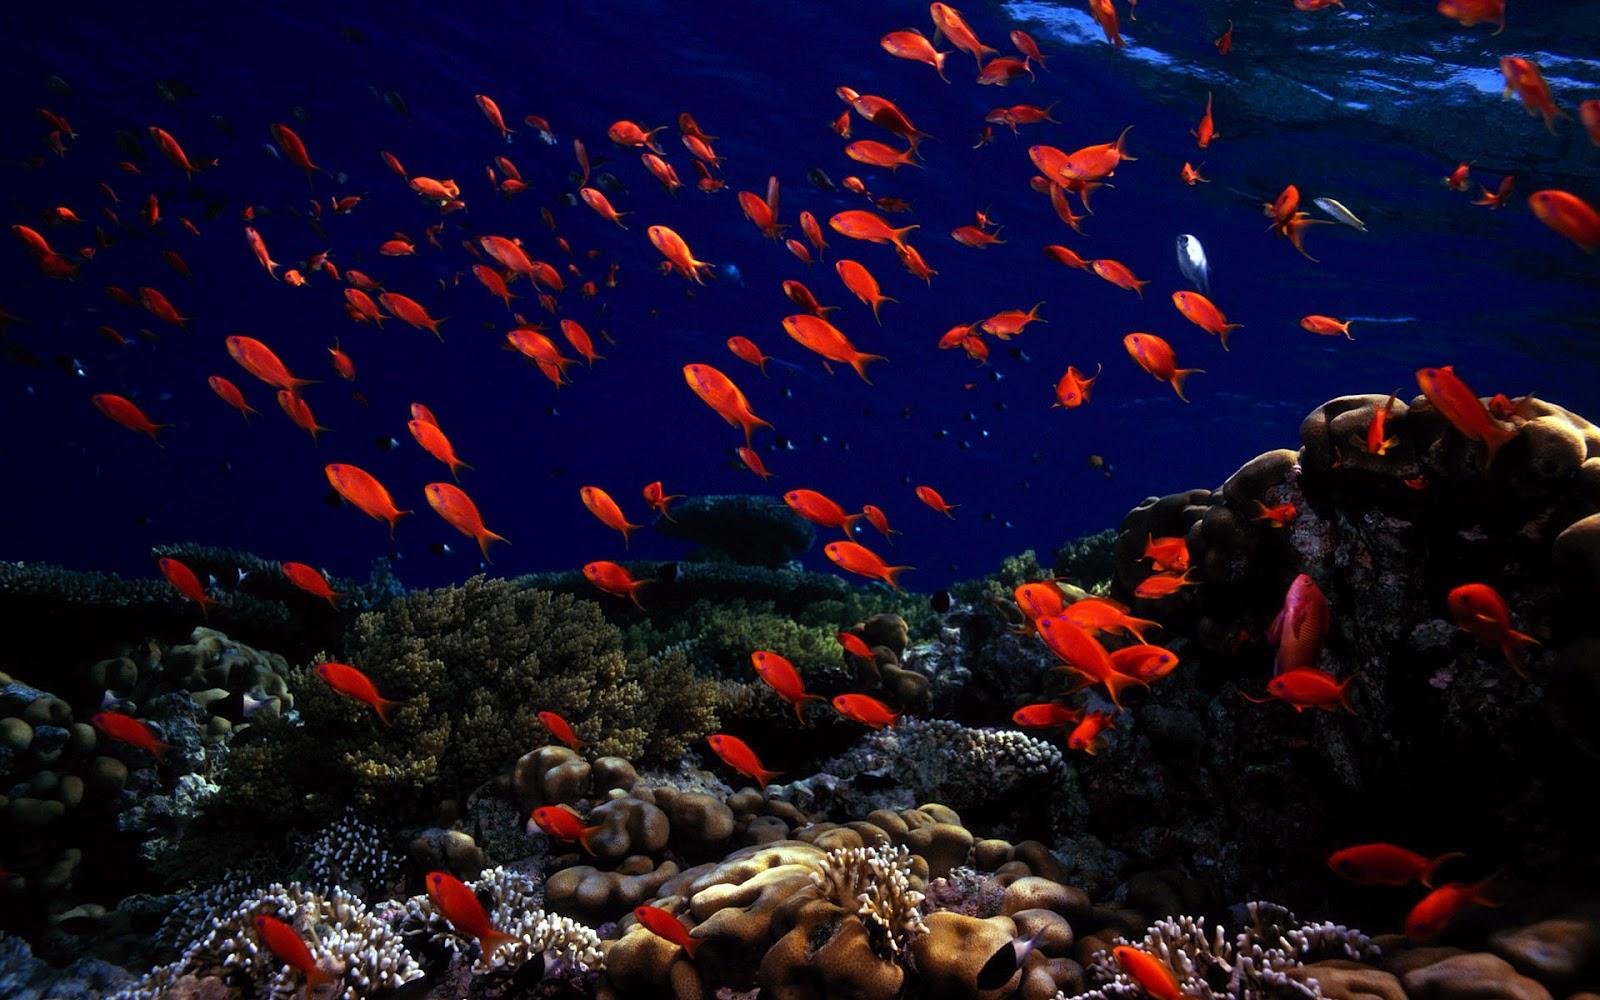 Free Download Best Wallpapers Collection Best Ocean Life Wallpaper